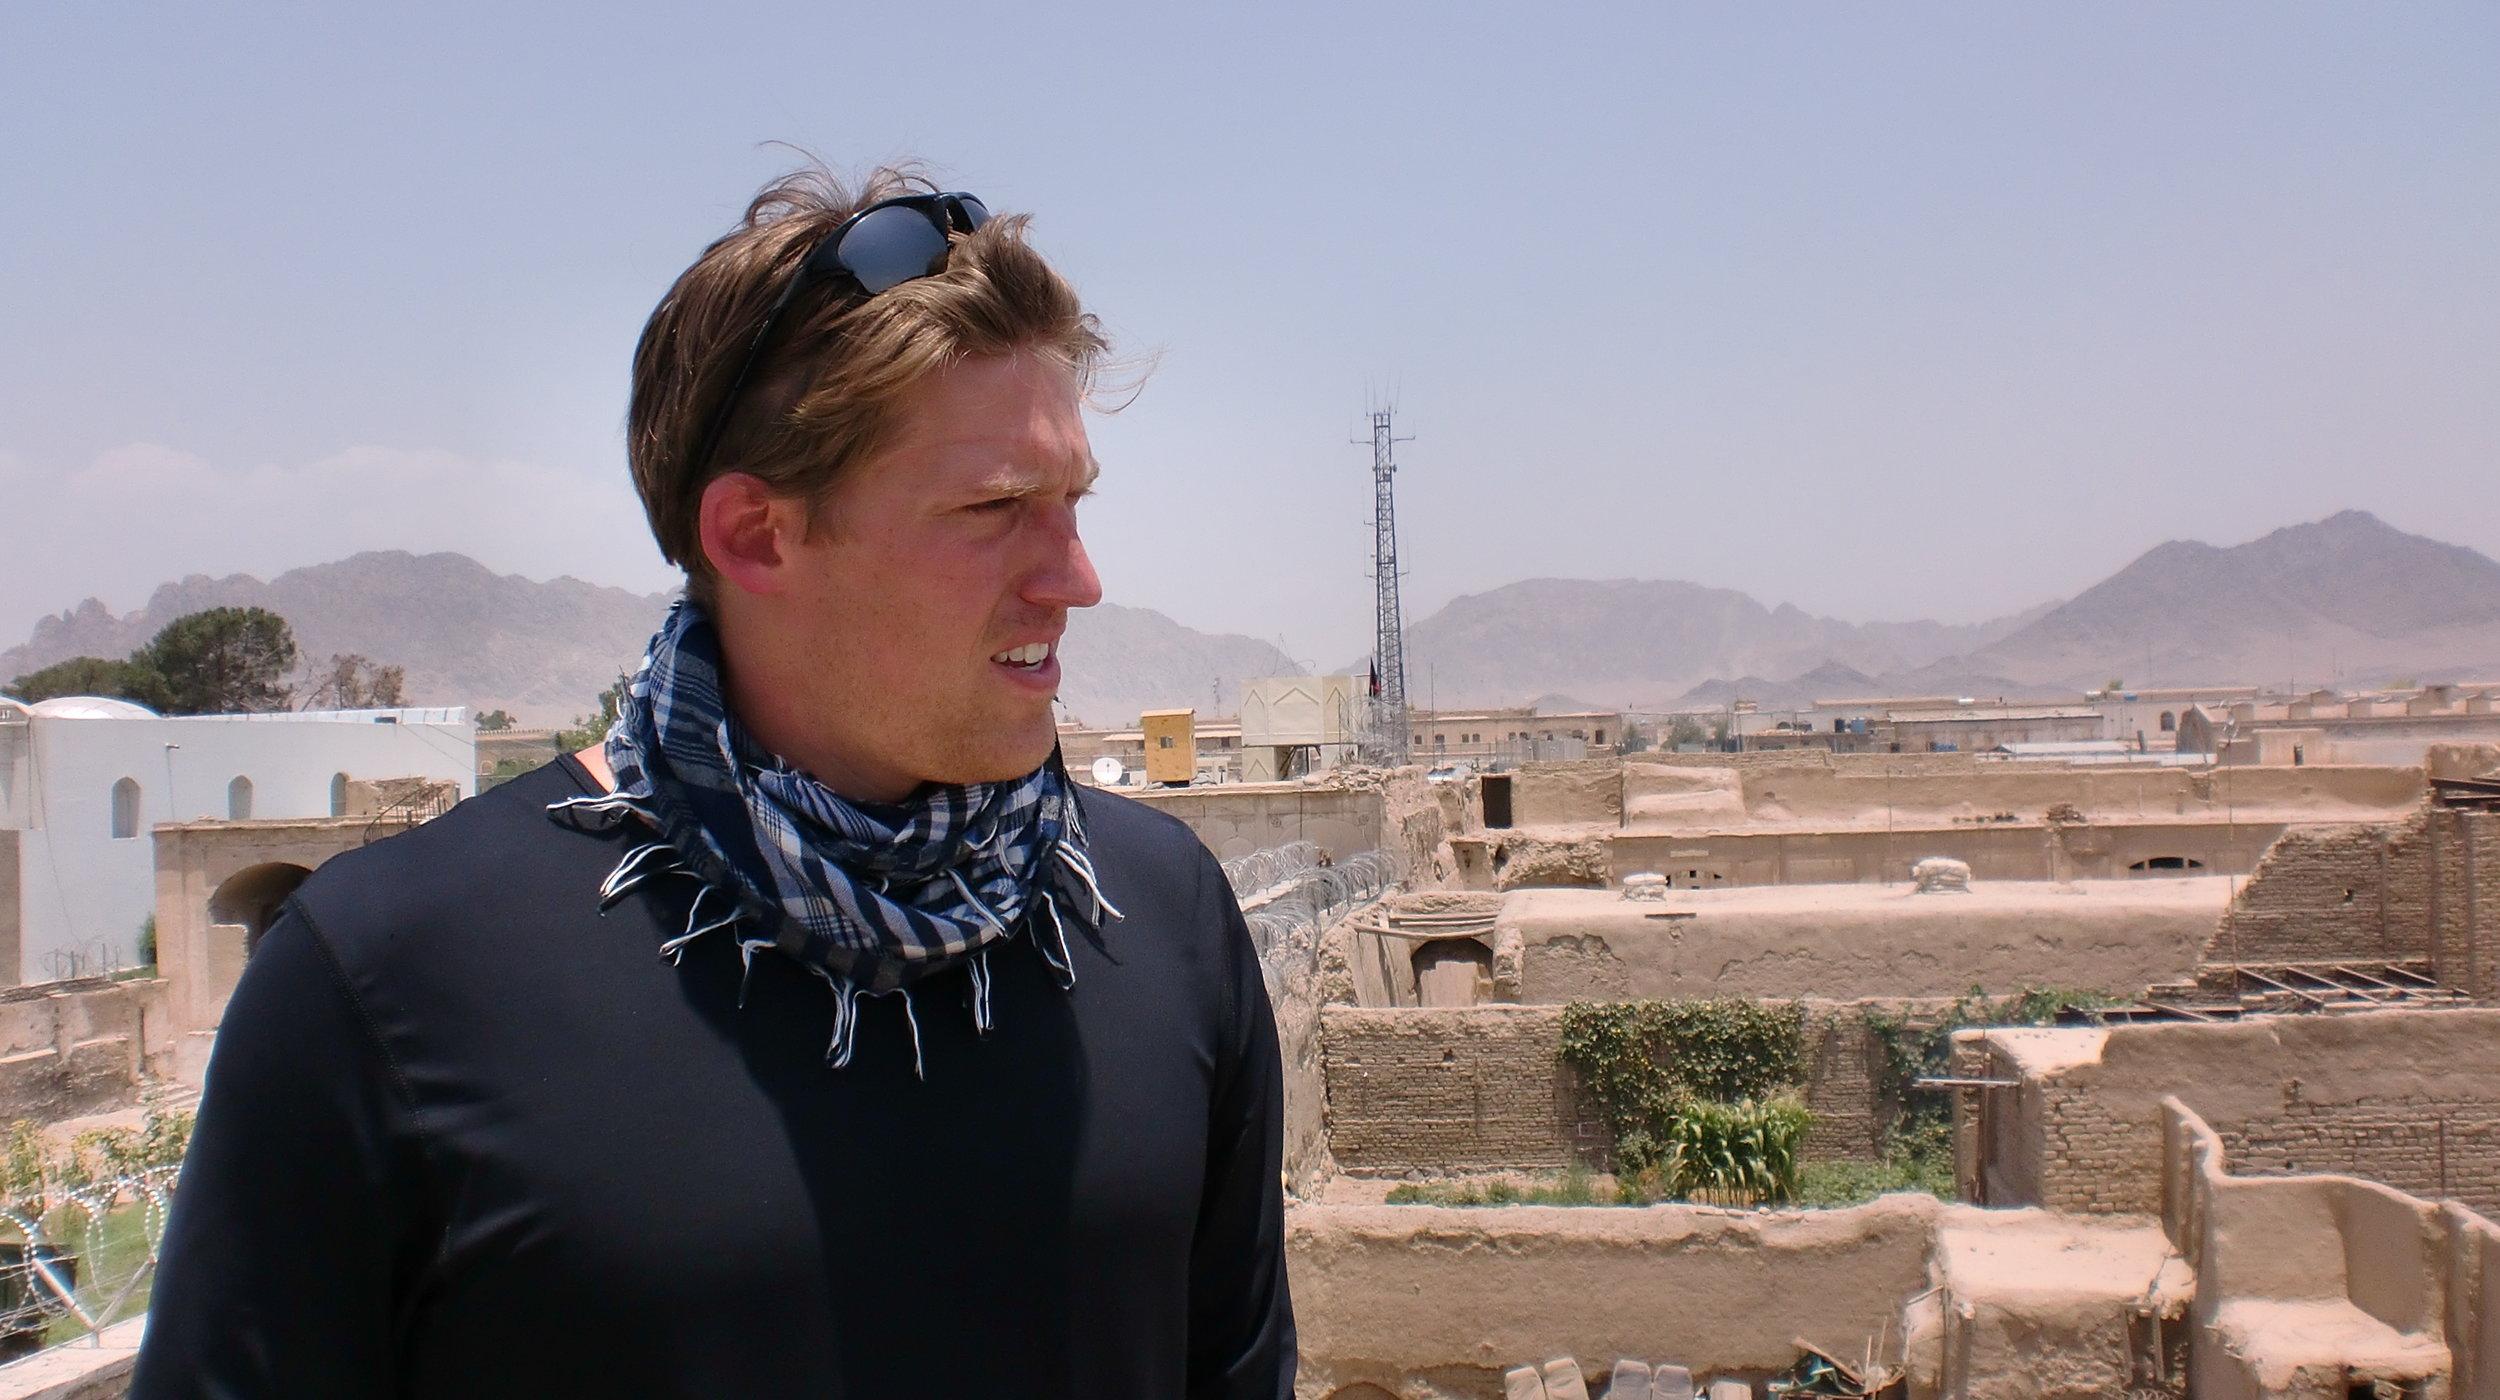 Conor in Kandahar solo.JPG